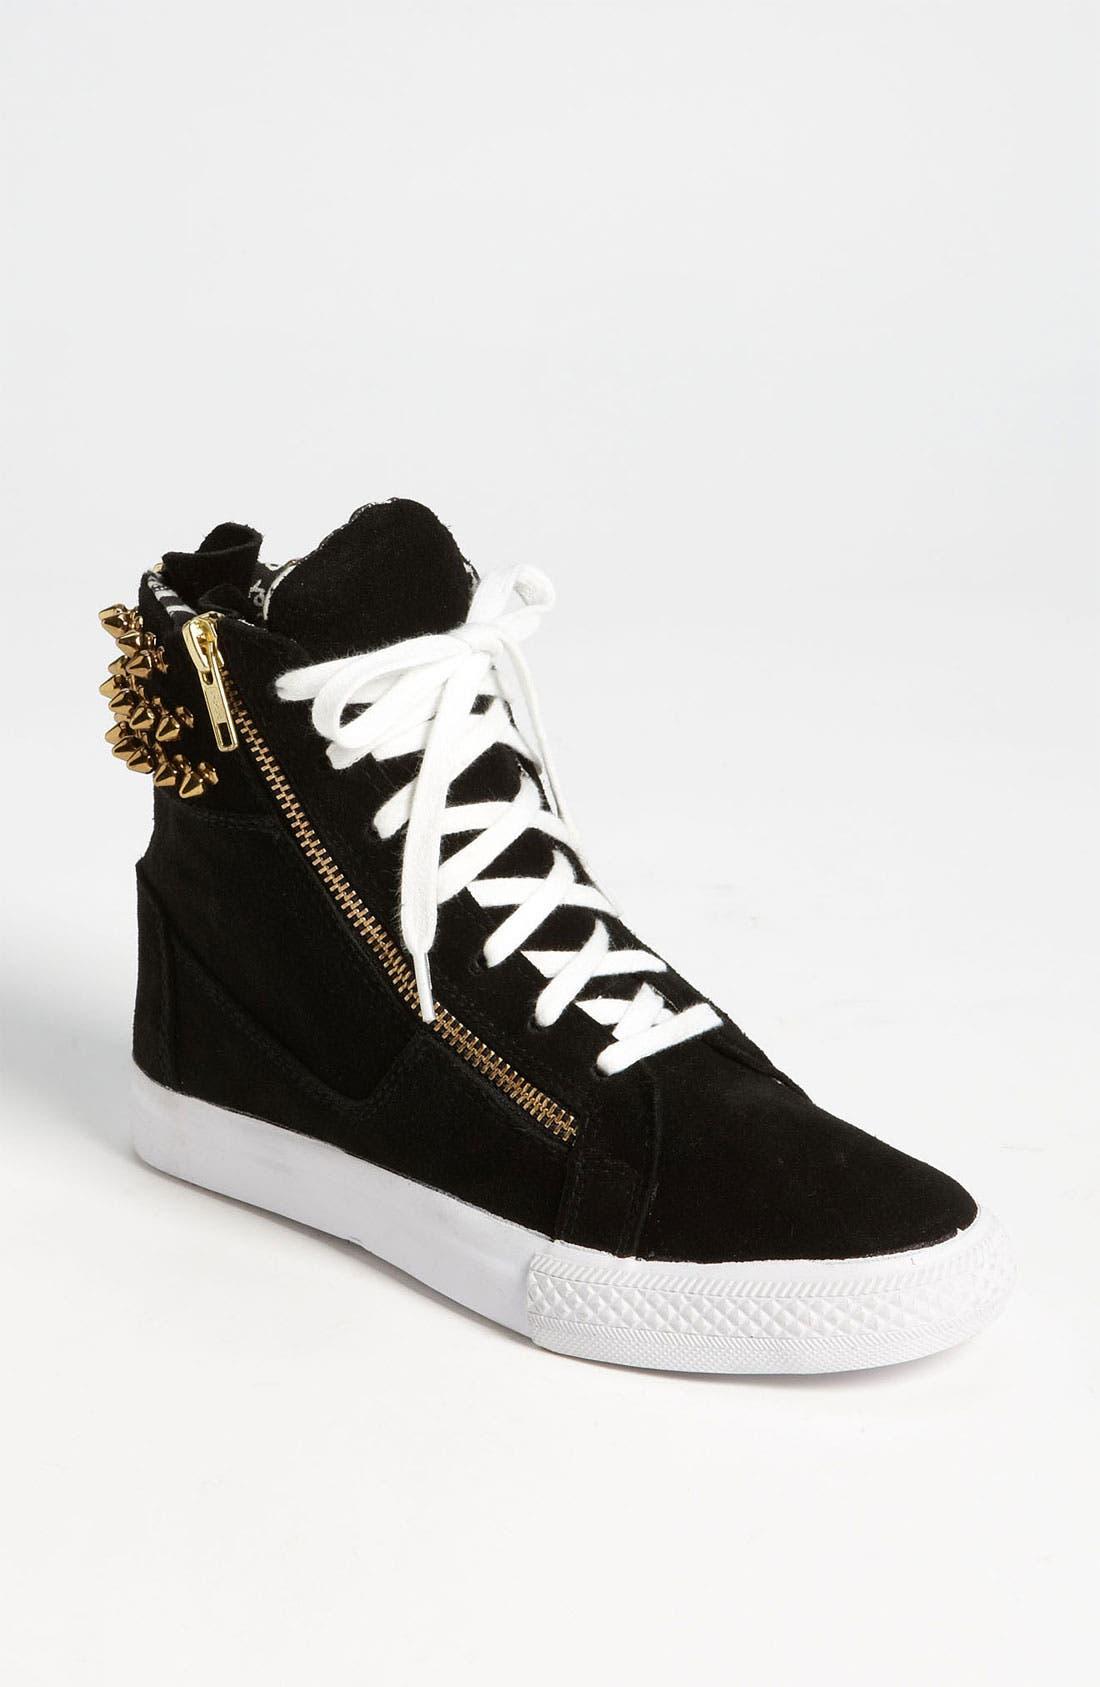 Alternate Image 1 Selected - Betsey Johnson 'NXTLVL' Sneaker